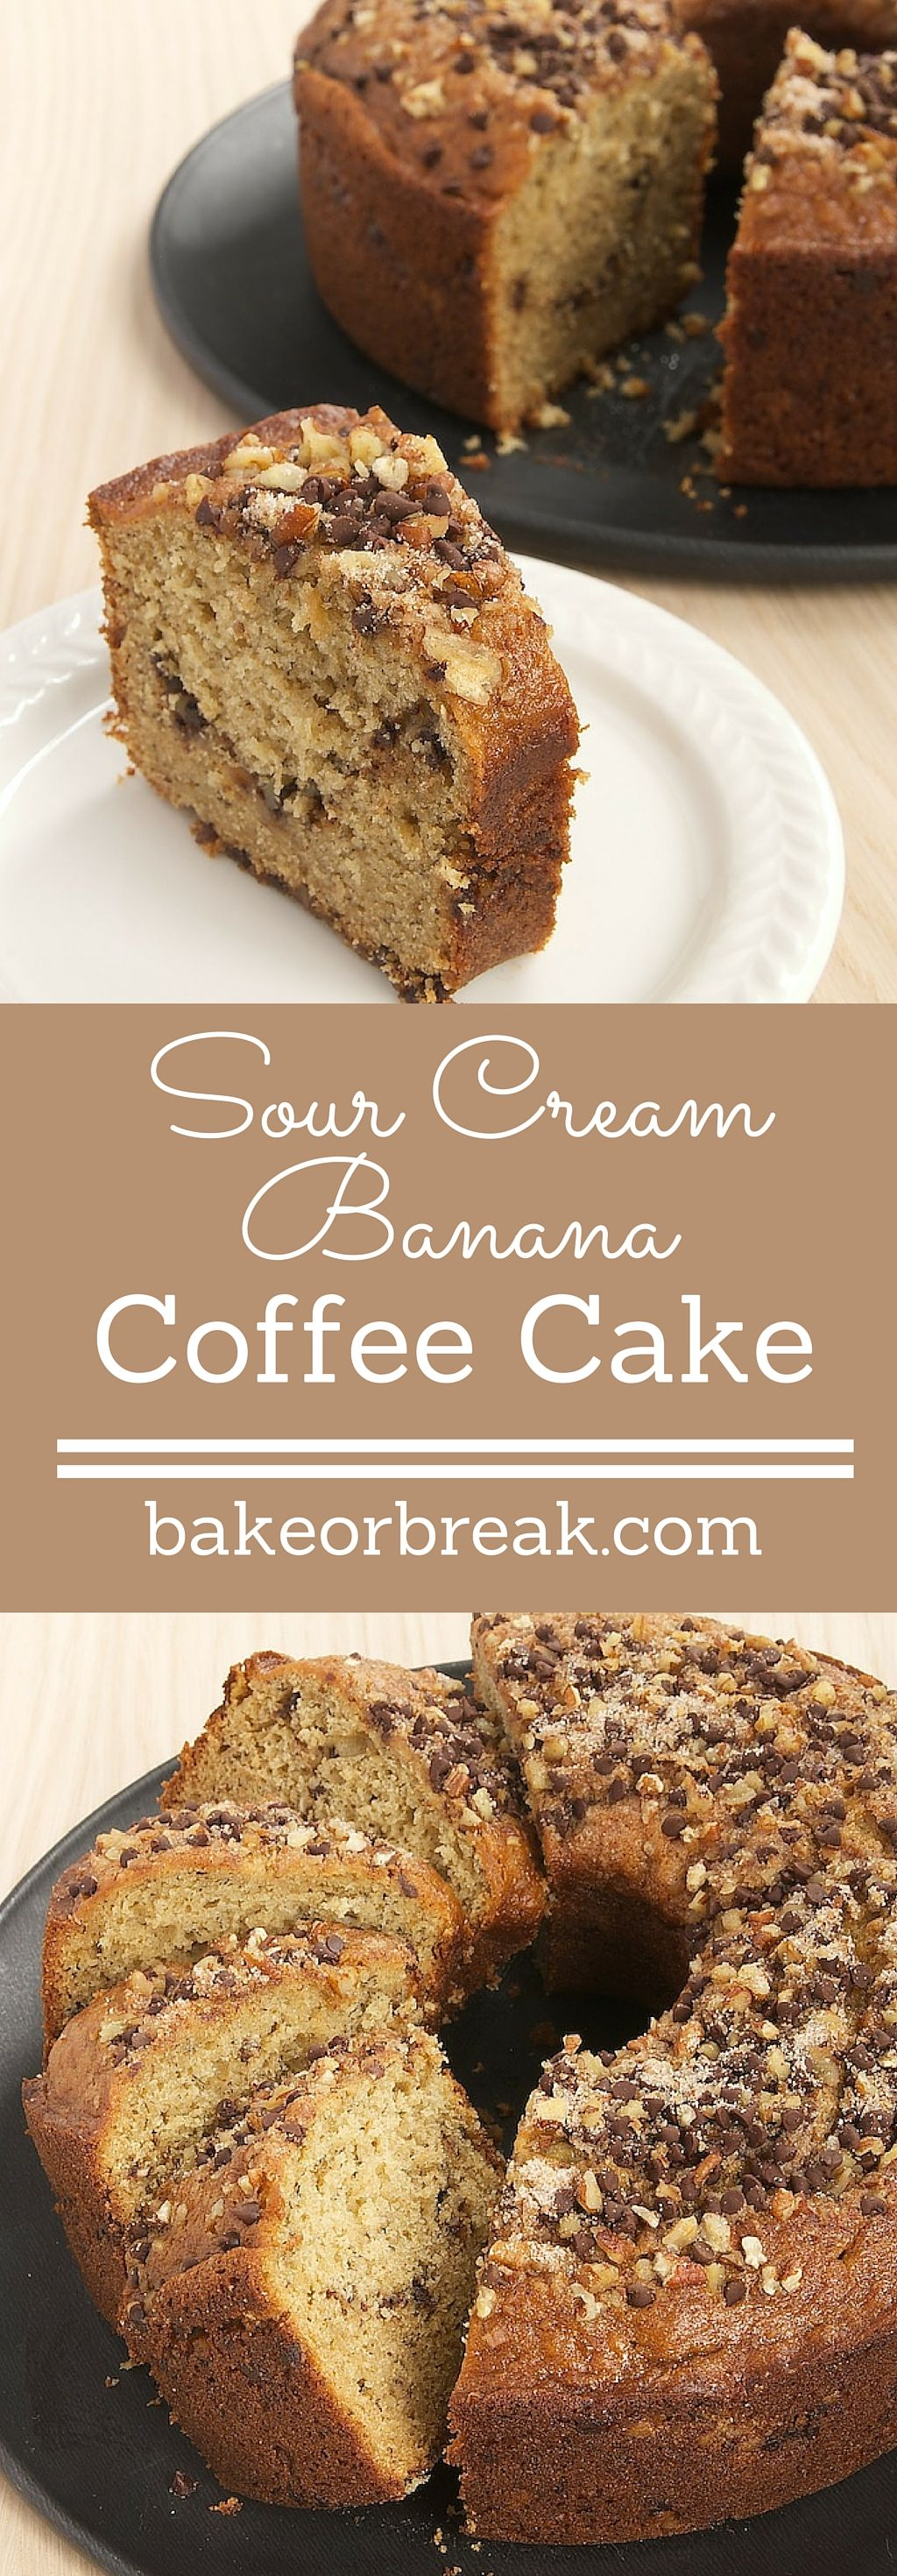 Sour Cream Banana Coffee Cake Recipe Banana Coffee Cakes Coffee Cake Banana Coffee